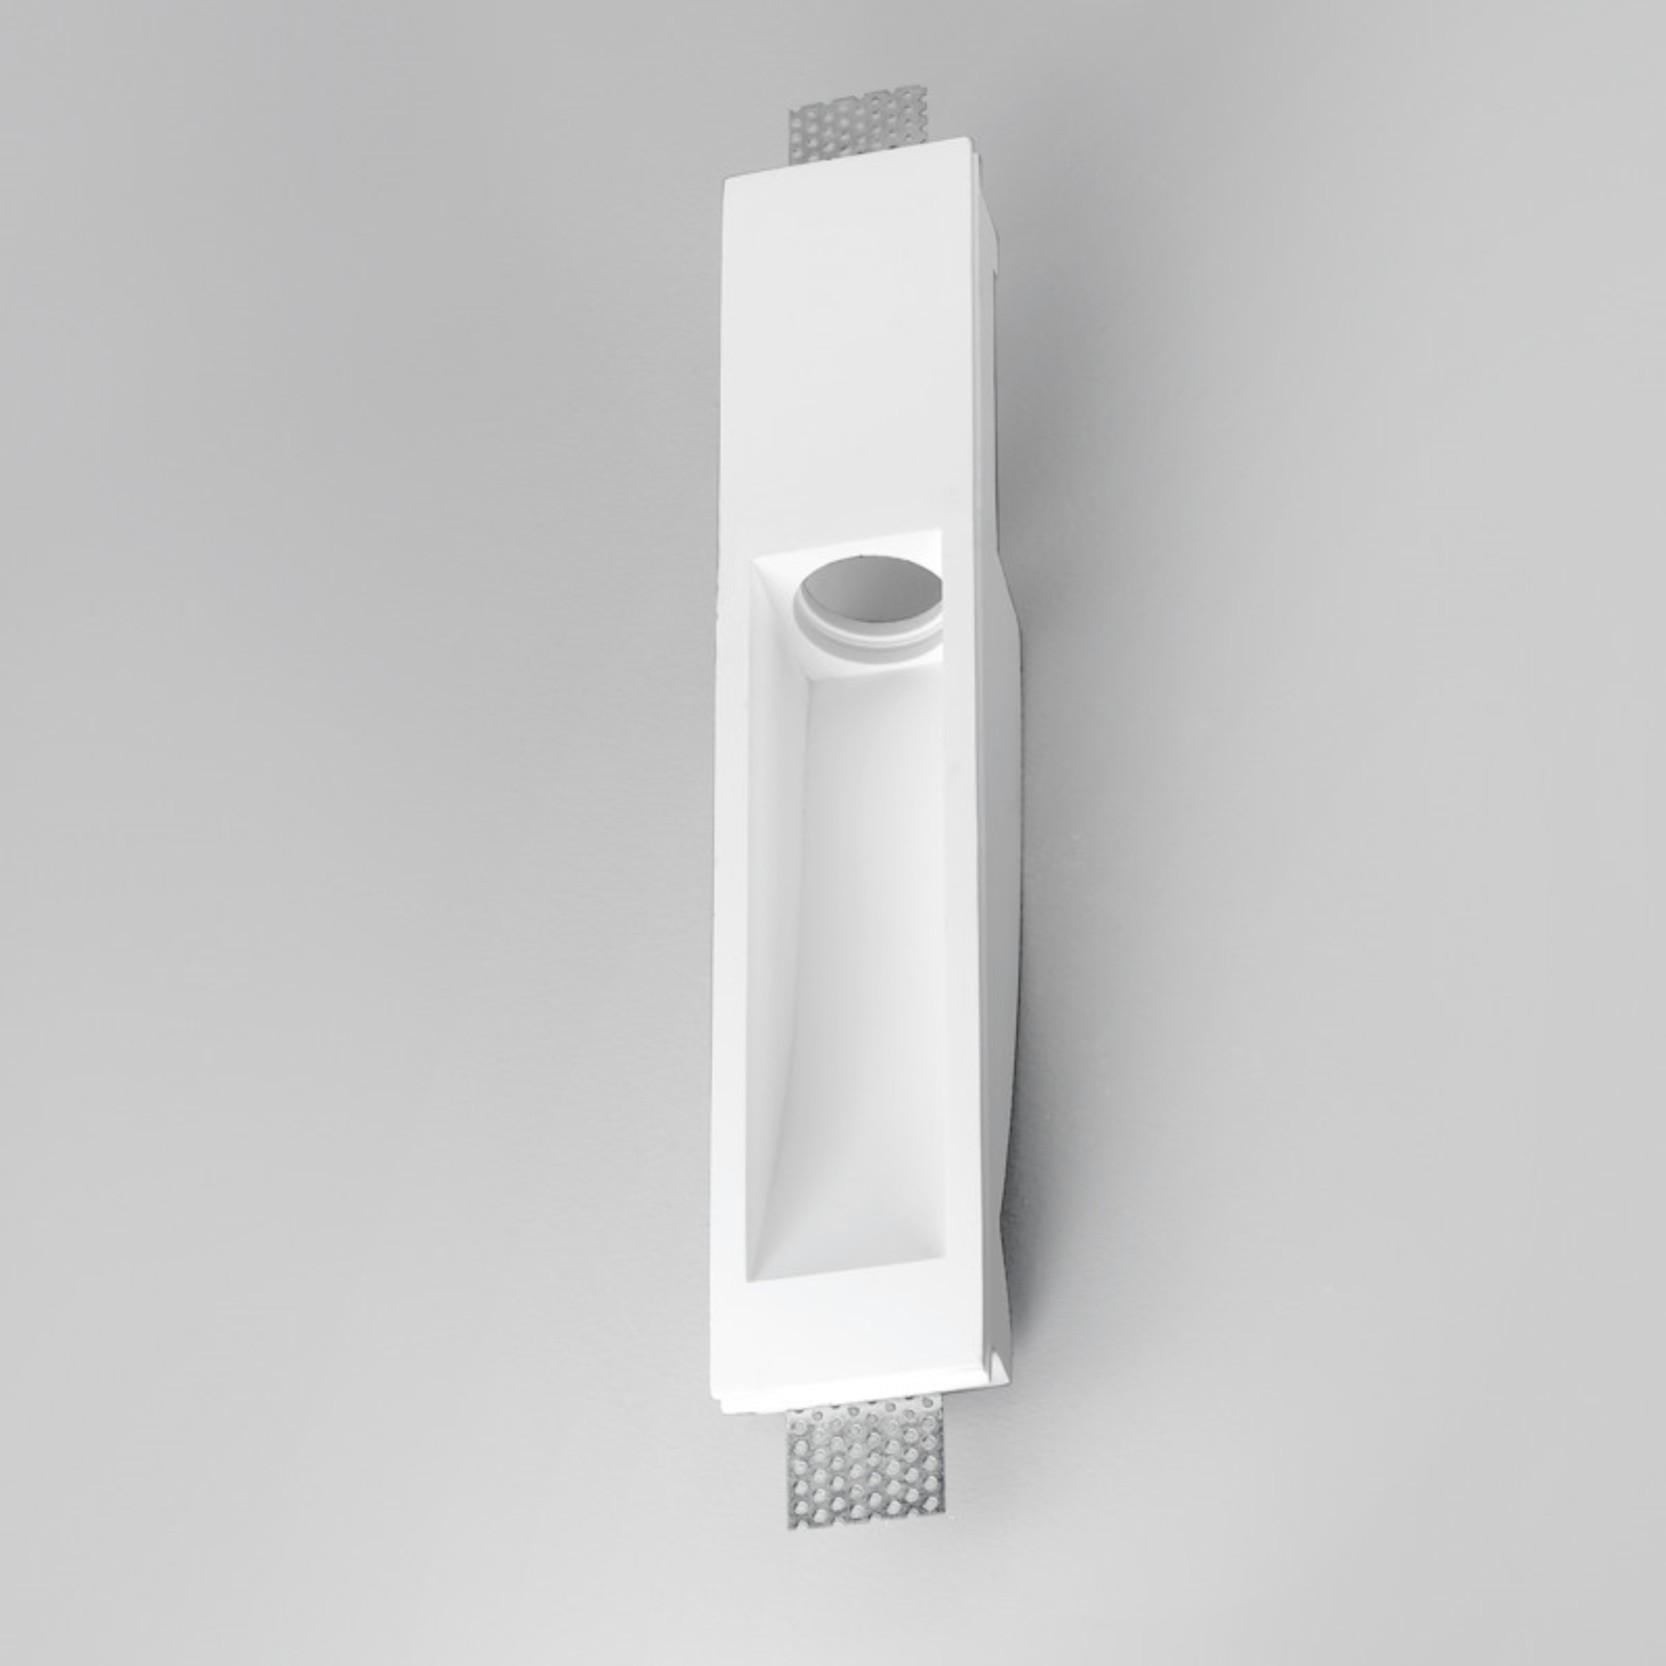 Invisibili by Panzeri – 3 1/8″ x 16 3/4″ Trimless, Spots offers quality European interior lighting design | Zaneen Design